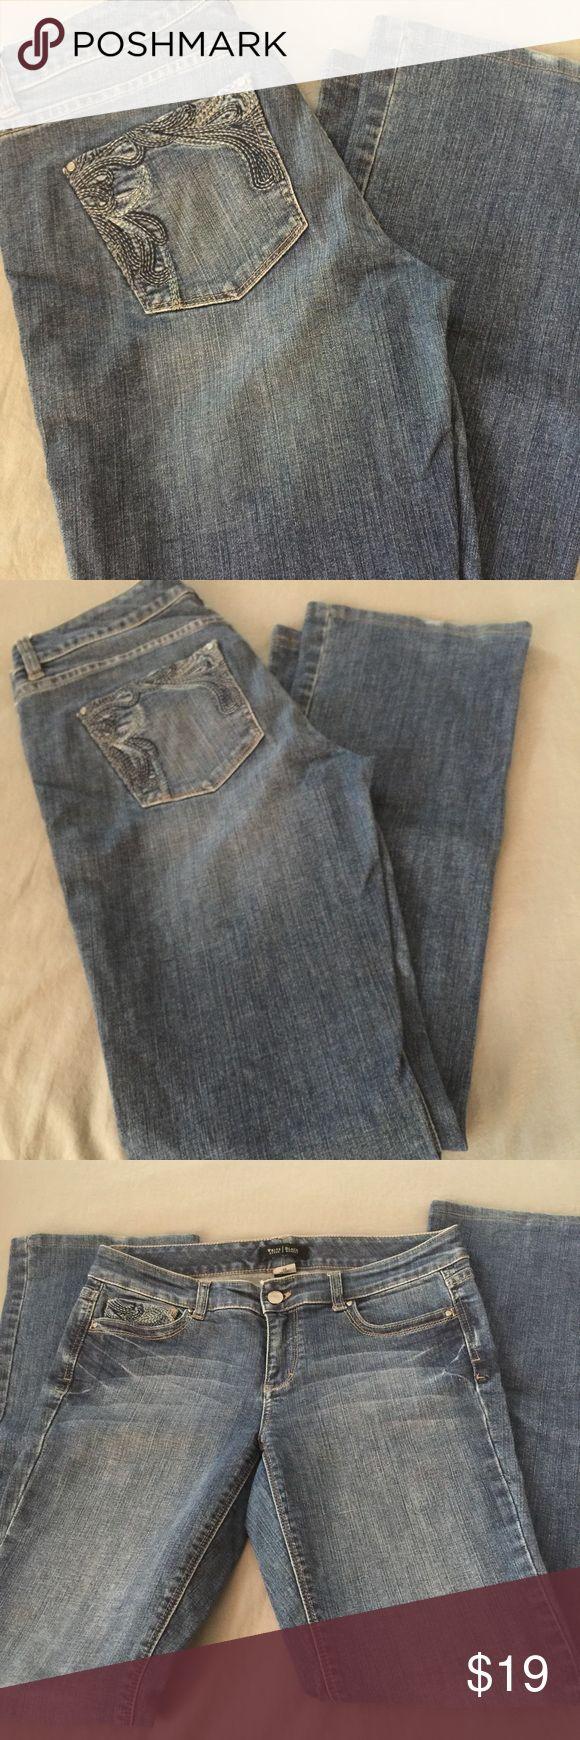 WHBM Blanc Bootleg Jeans 👖 6R White House Black Market Blanc Bootleg jeans.  Perfect condition.  Super cute! White House Black Market Jeans Boot Cut